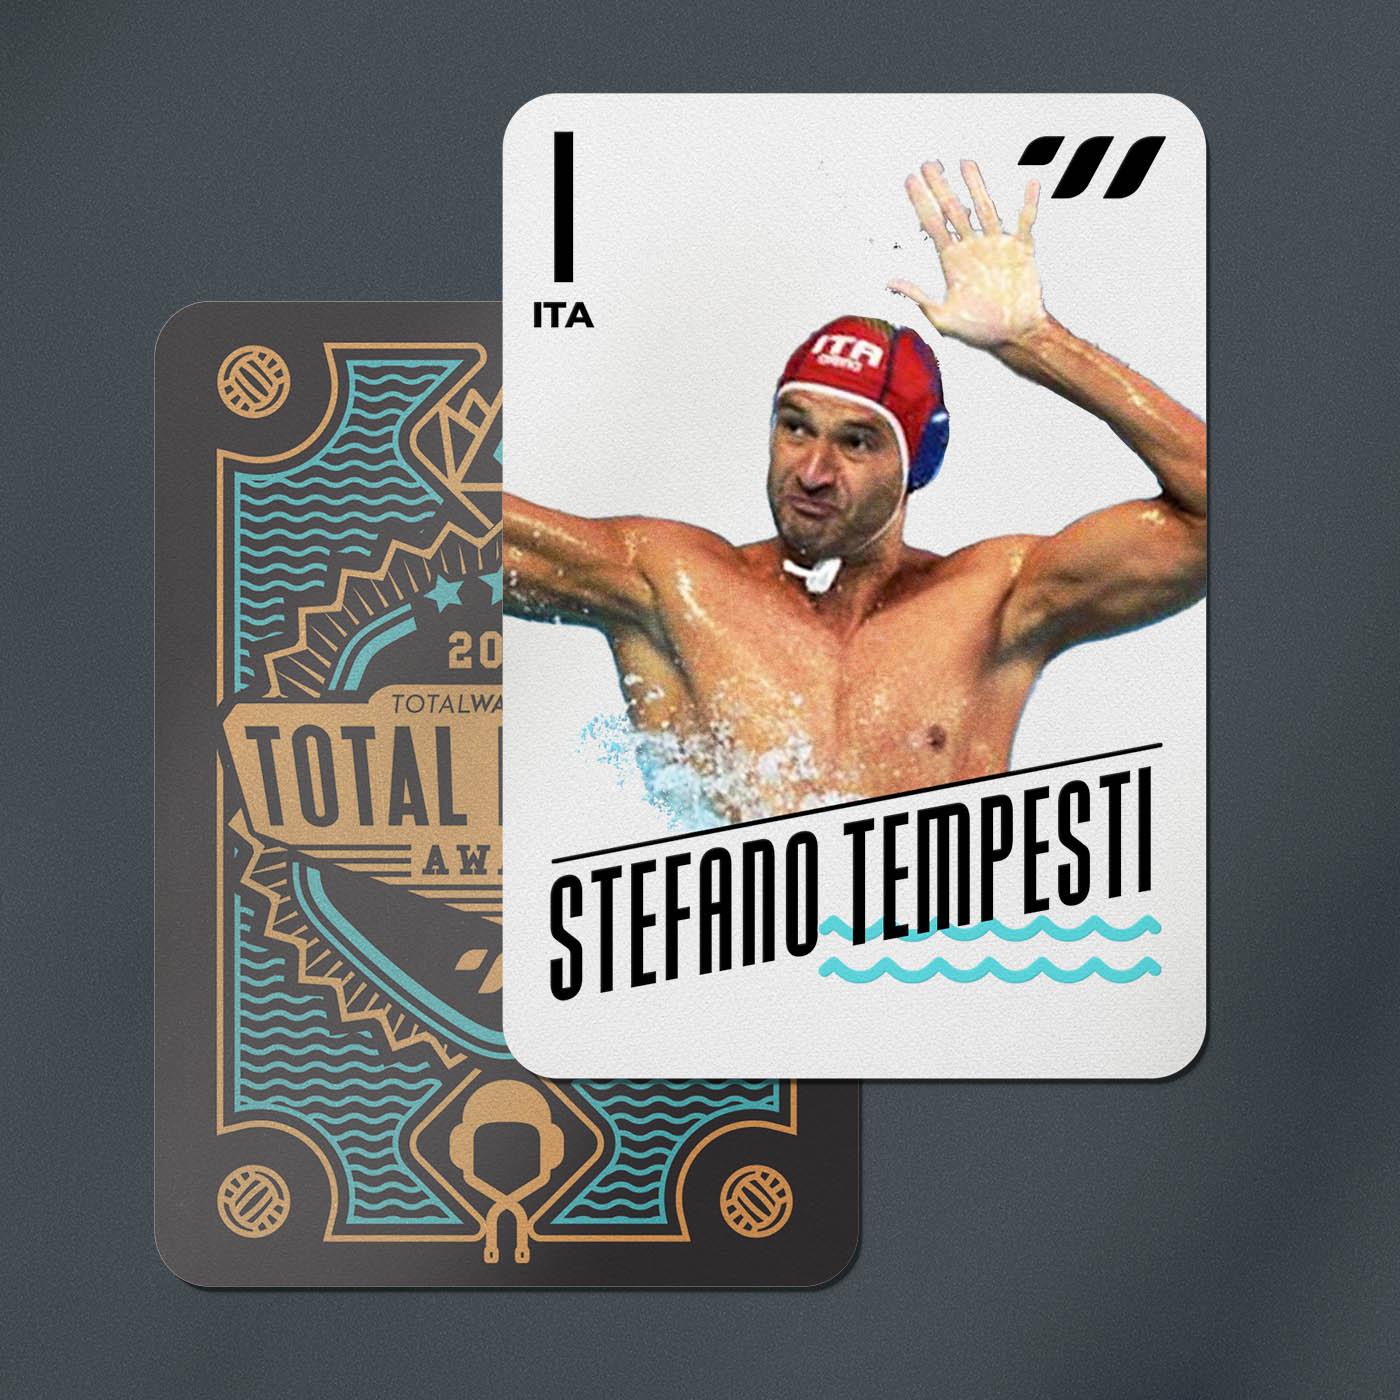 GOALKEEPER - Stefano Tempesti (ITA)